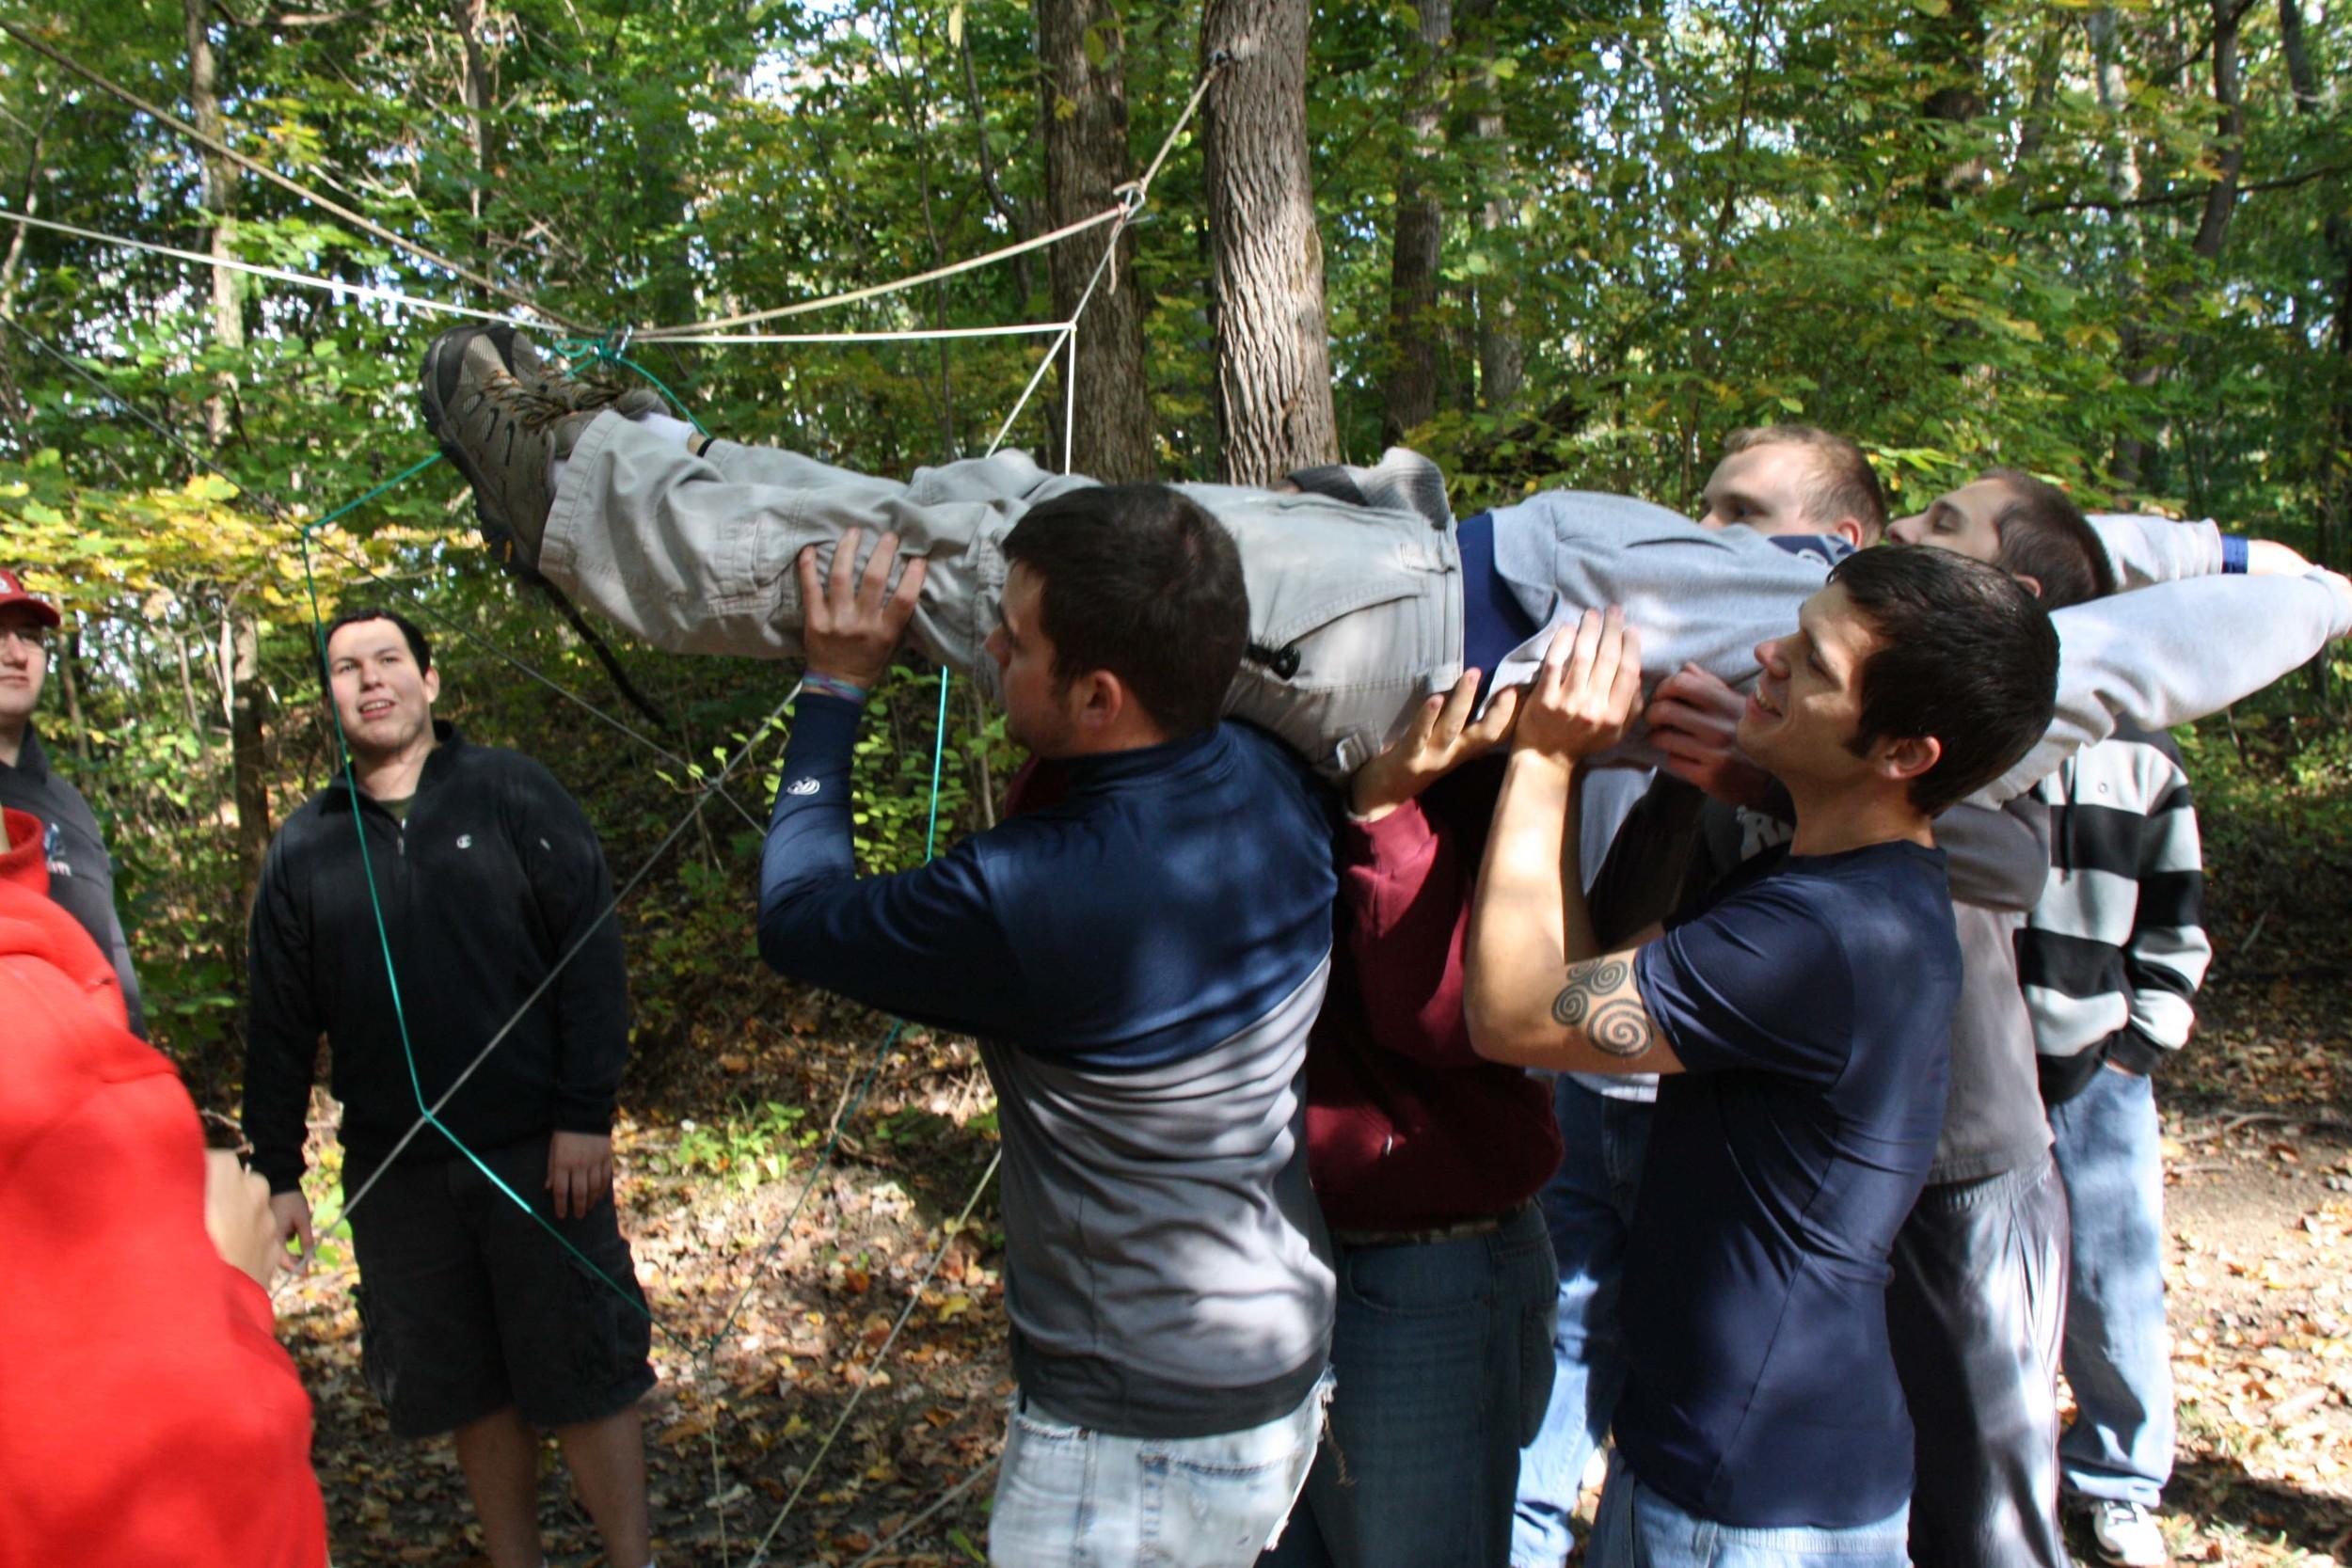 Camping Retreat - September 30 - October 1, 2011 (Image 139).jpg